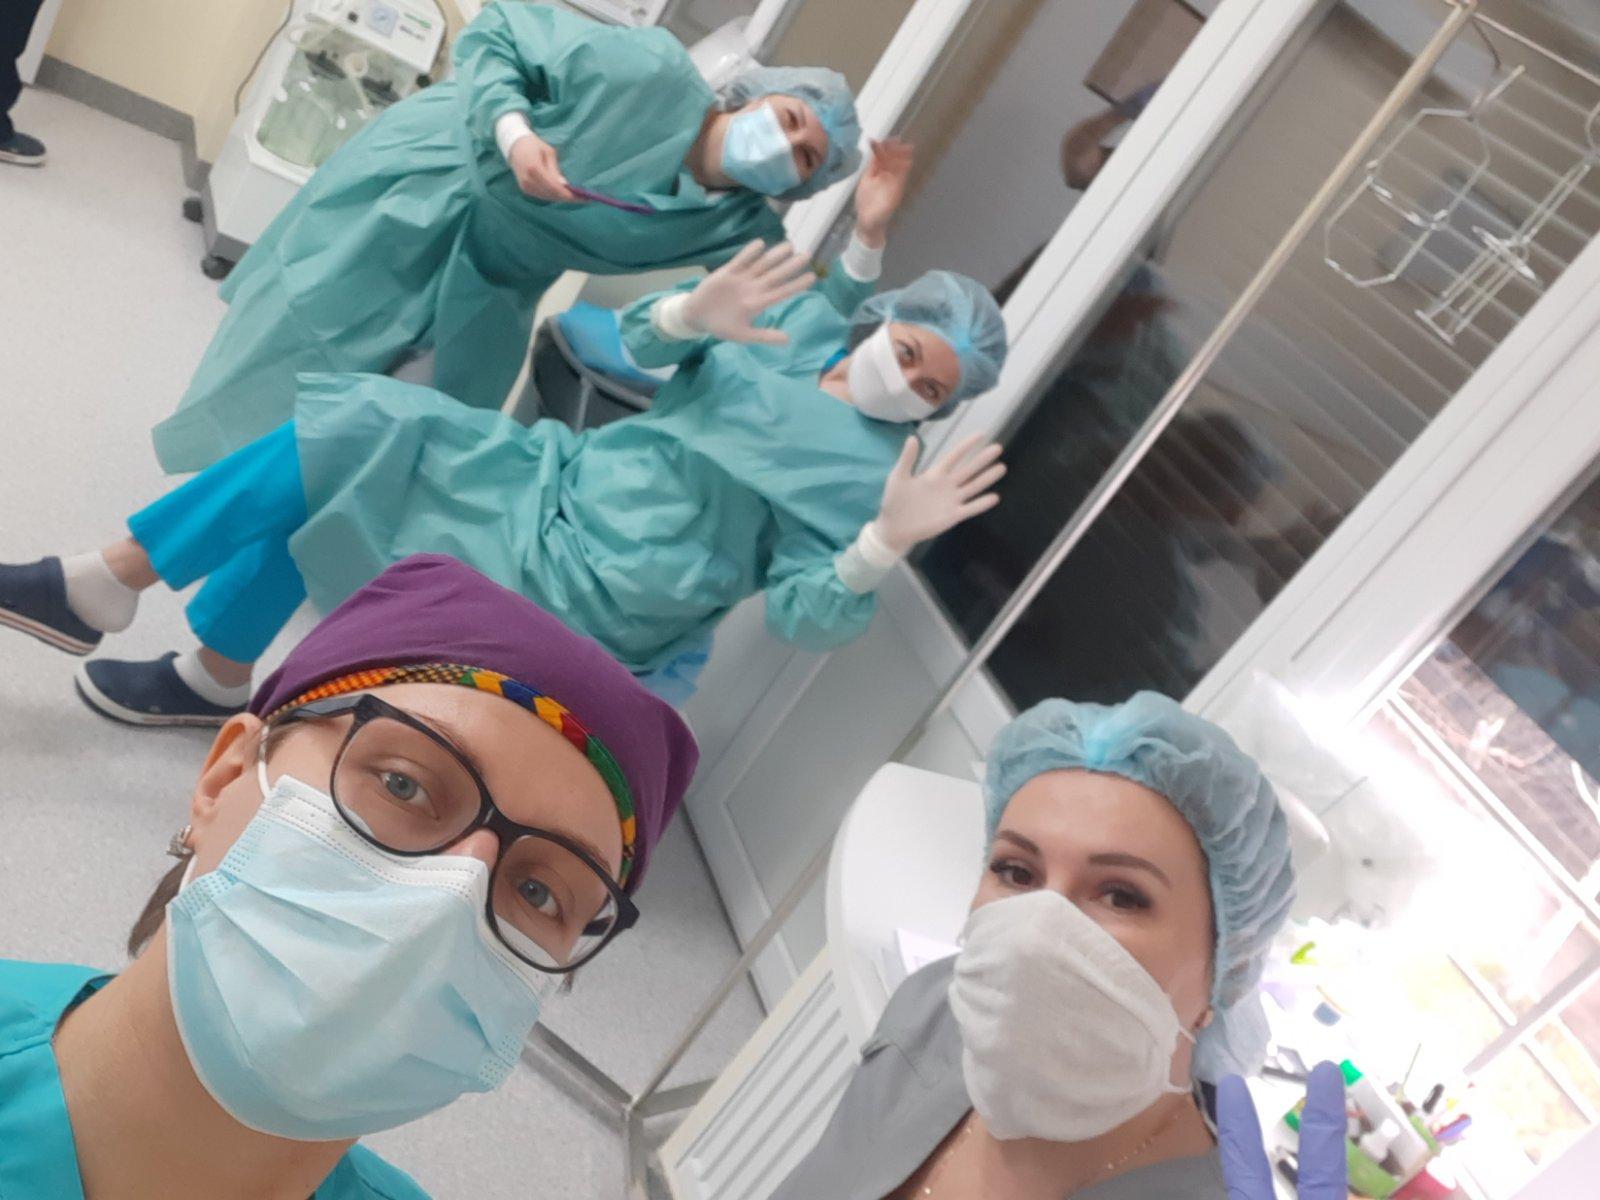 анестезиологи томоклиник